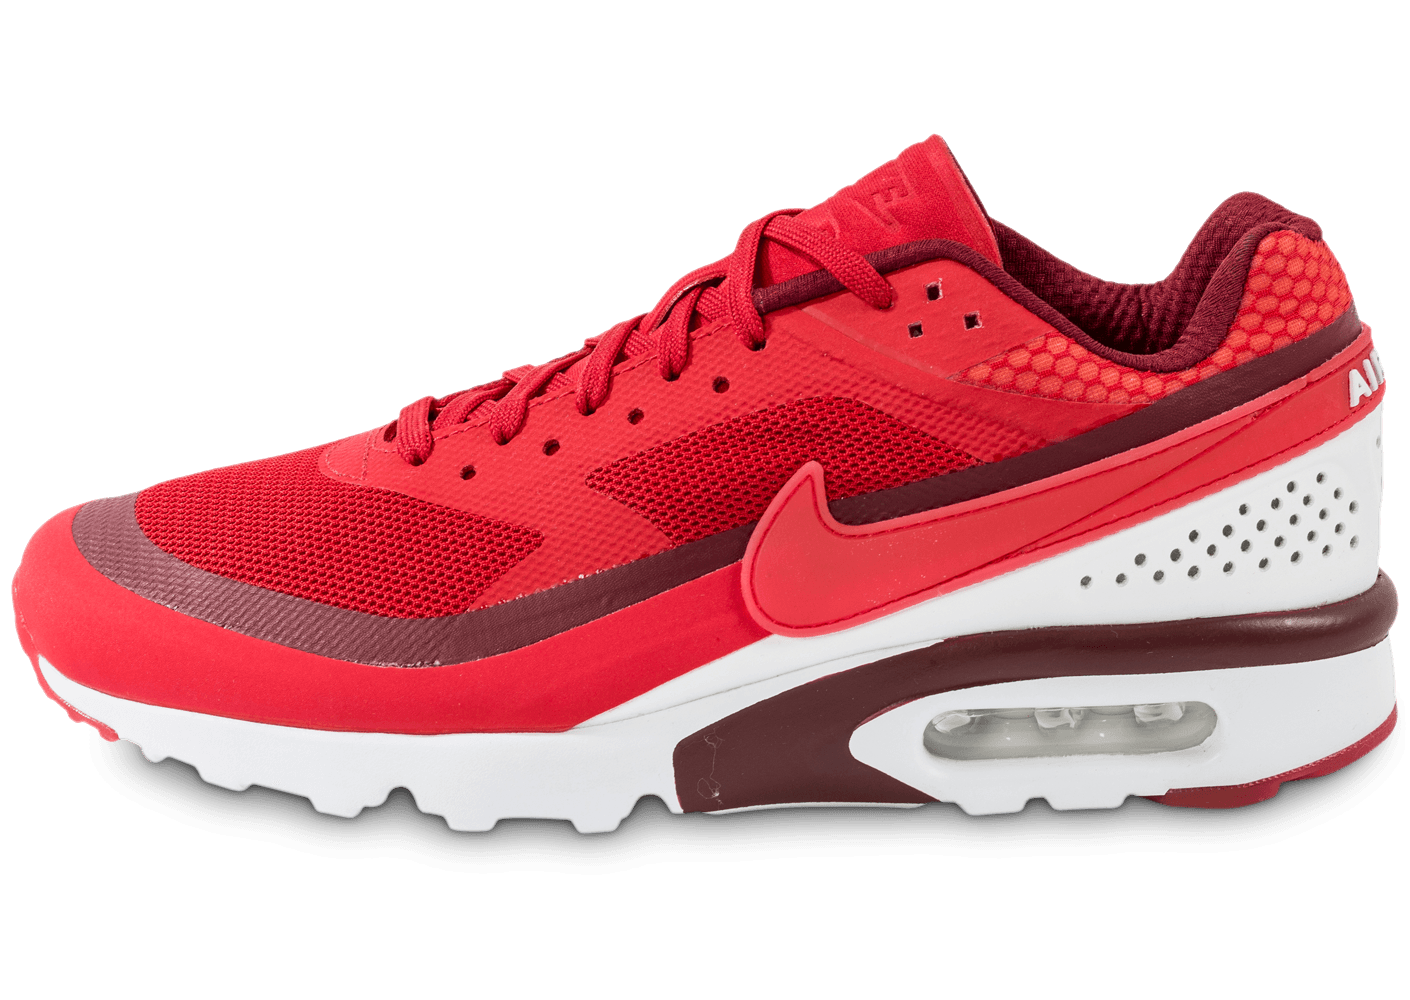 Femme Nike redwhite Chaussures Baskets Air Max BW Ultra